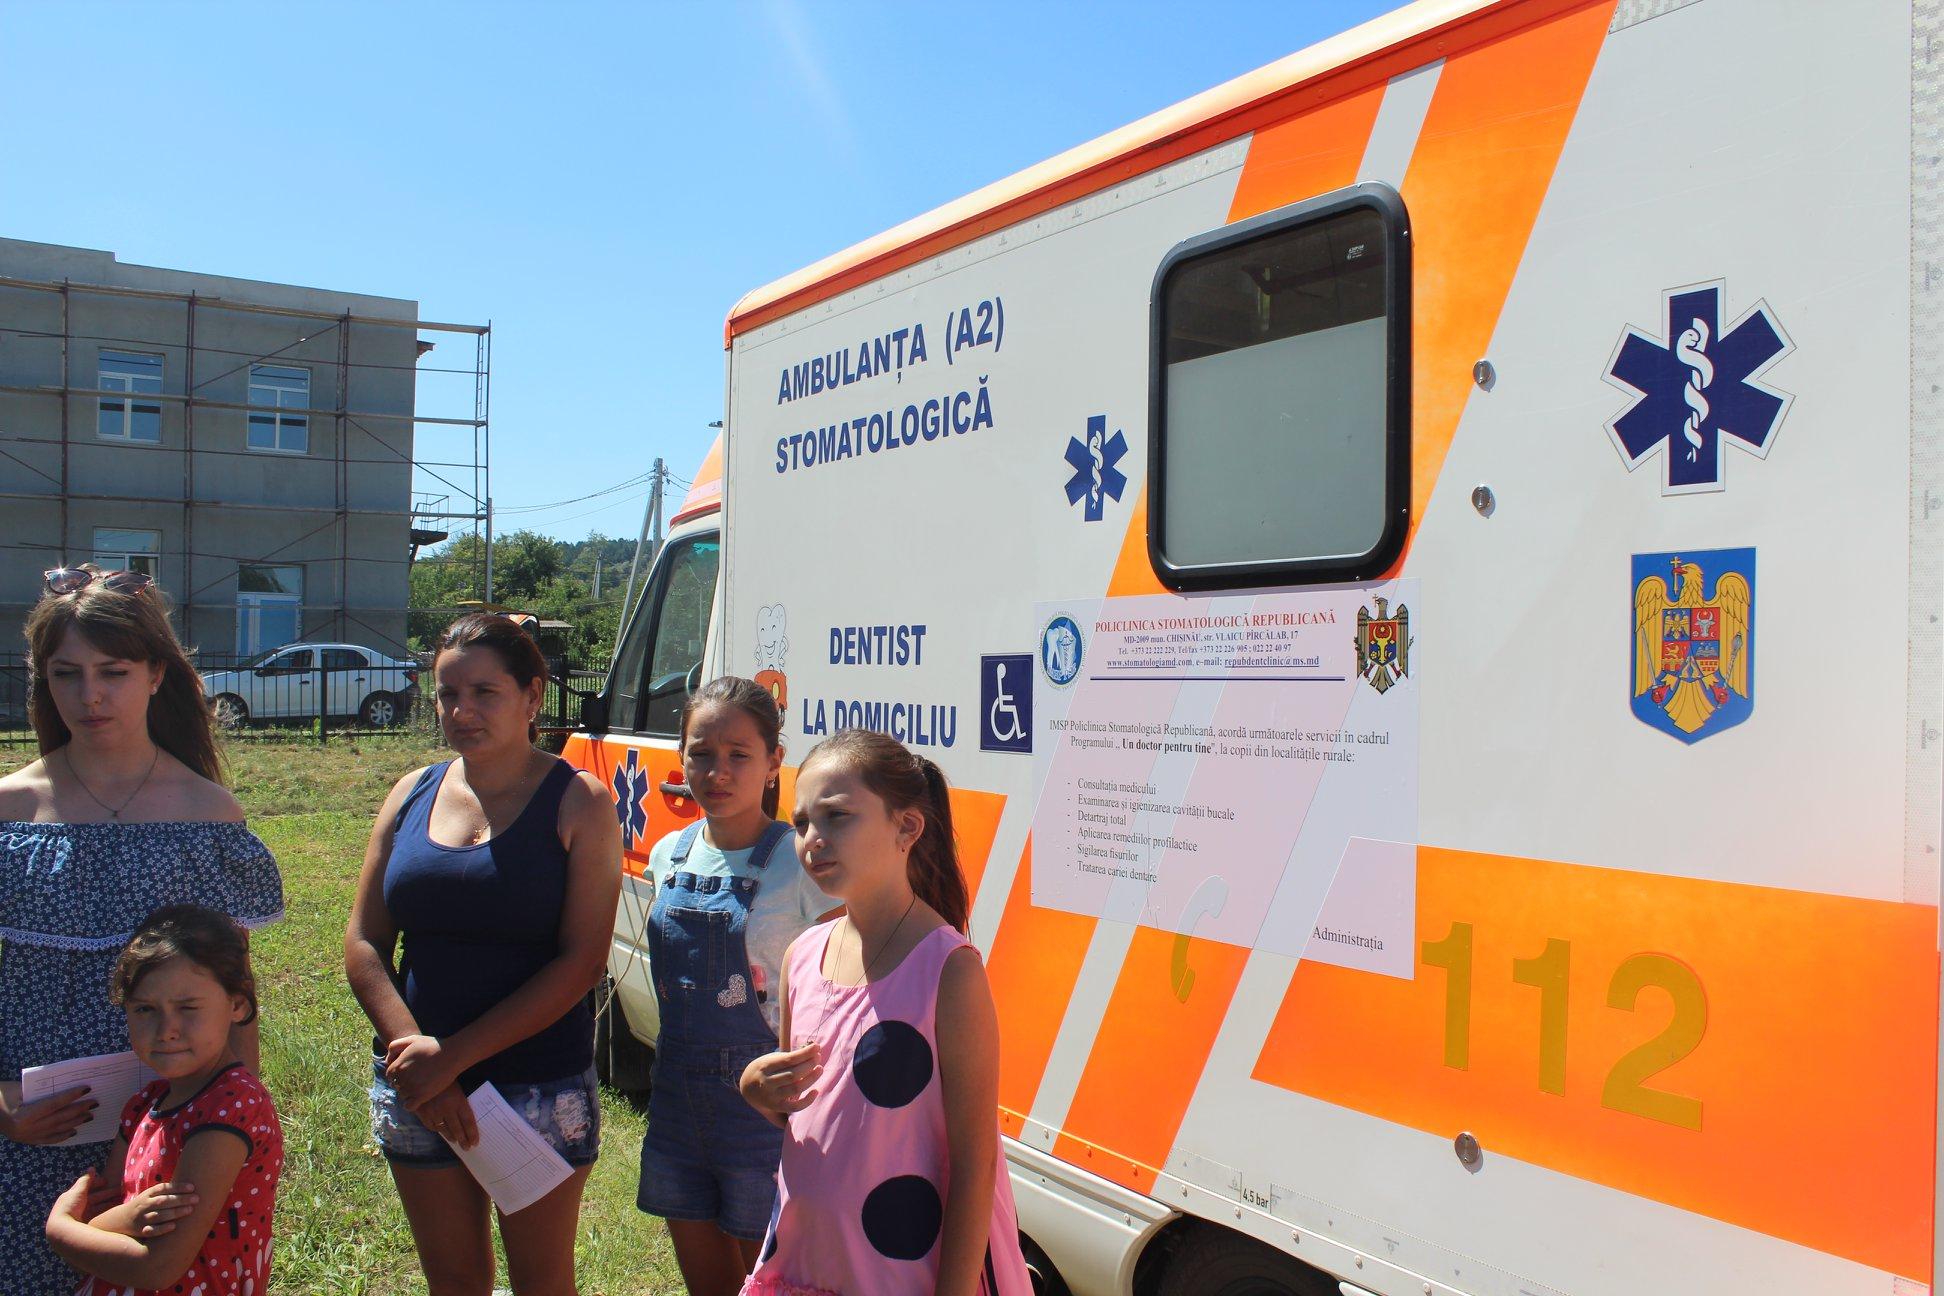 guvernul republicii moldova, ministerul sanatatii, raionul hincesti, medici ambulanti